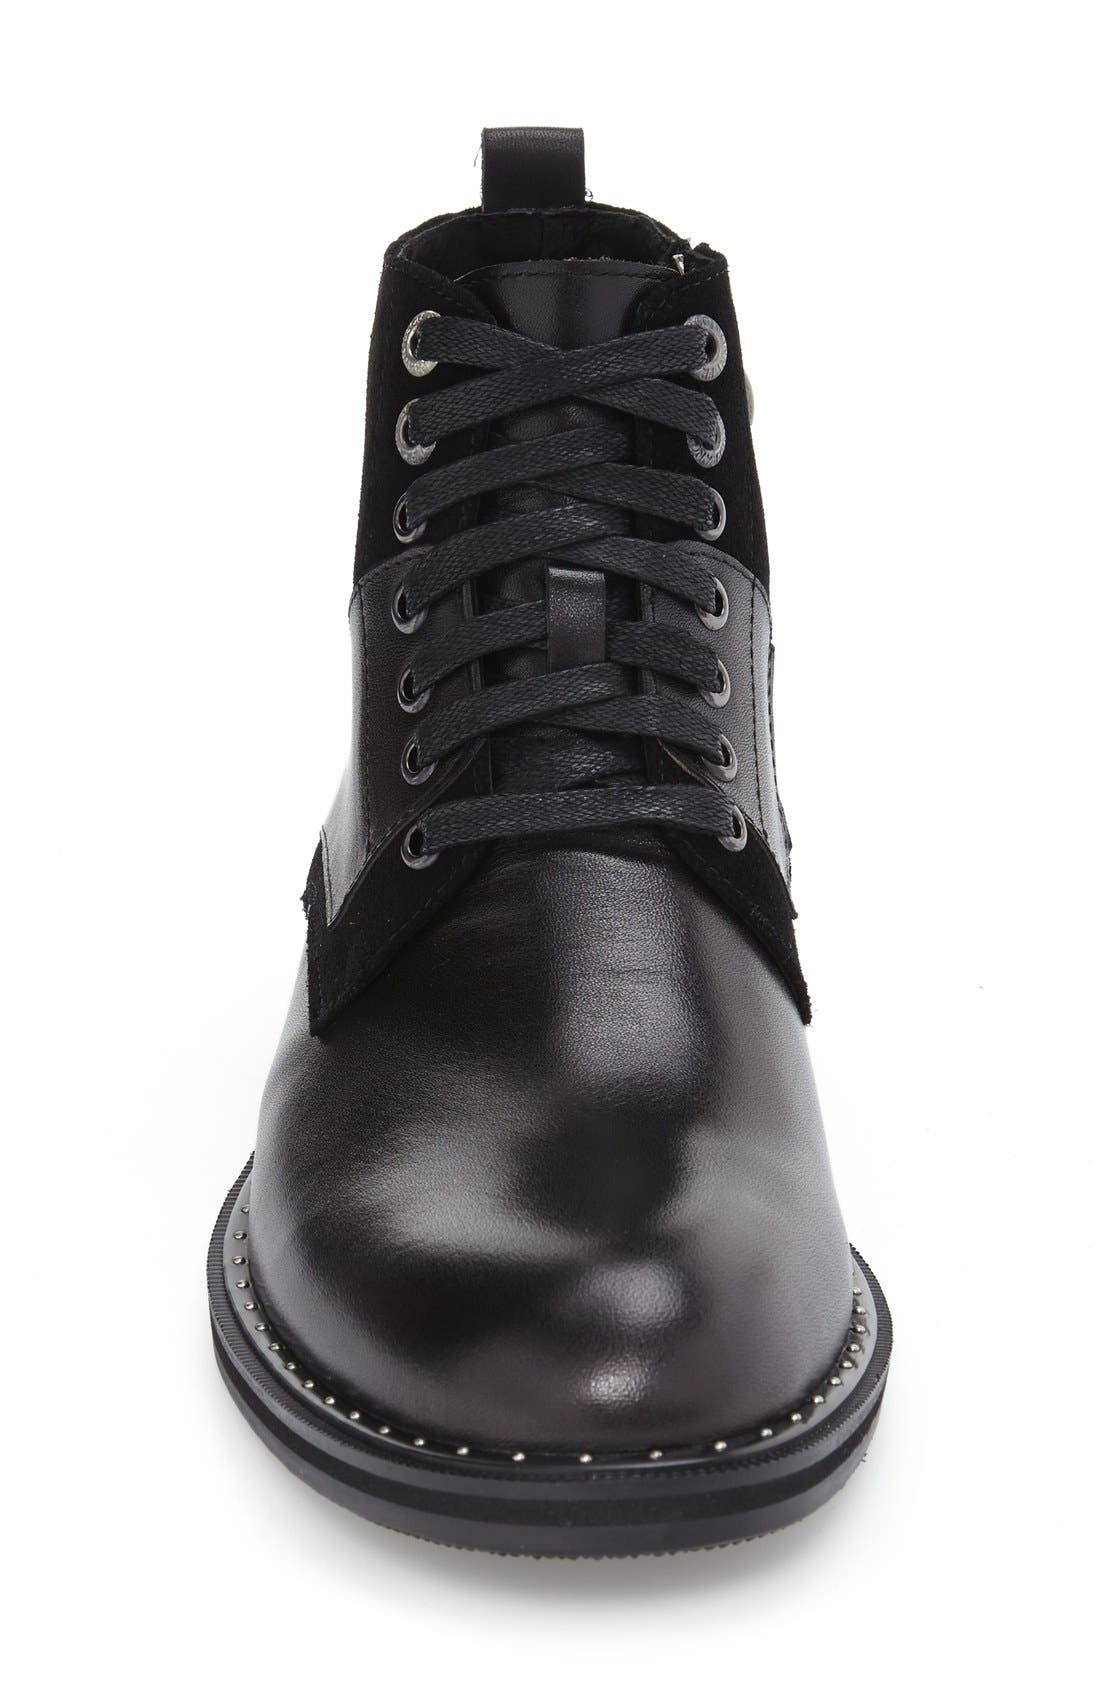 Alternate Image 3  - Zanzara 'Verona' Midi Studded Boot (Men)